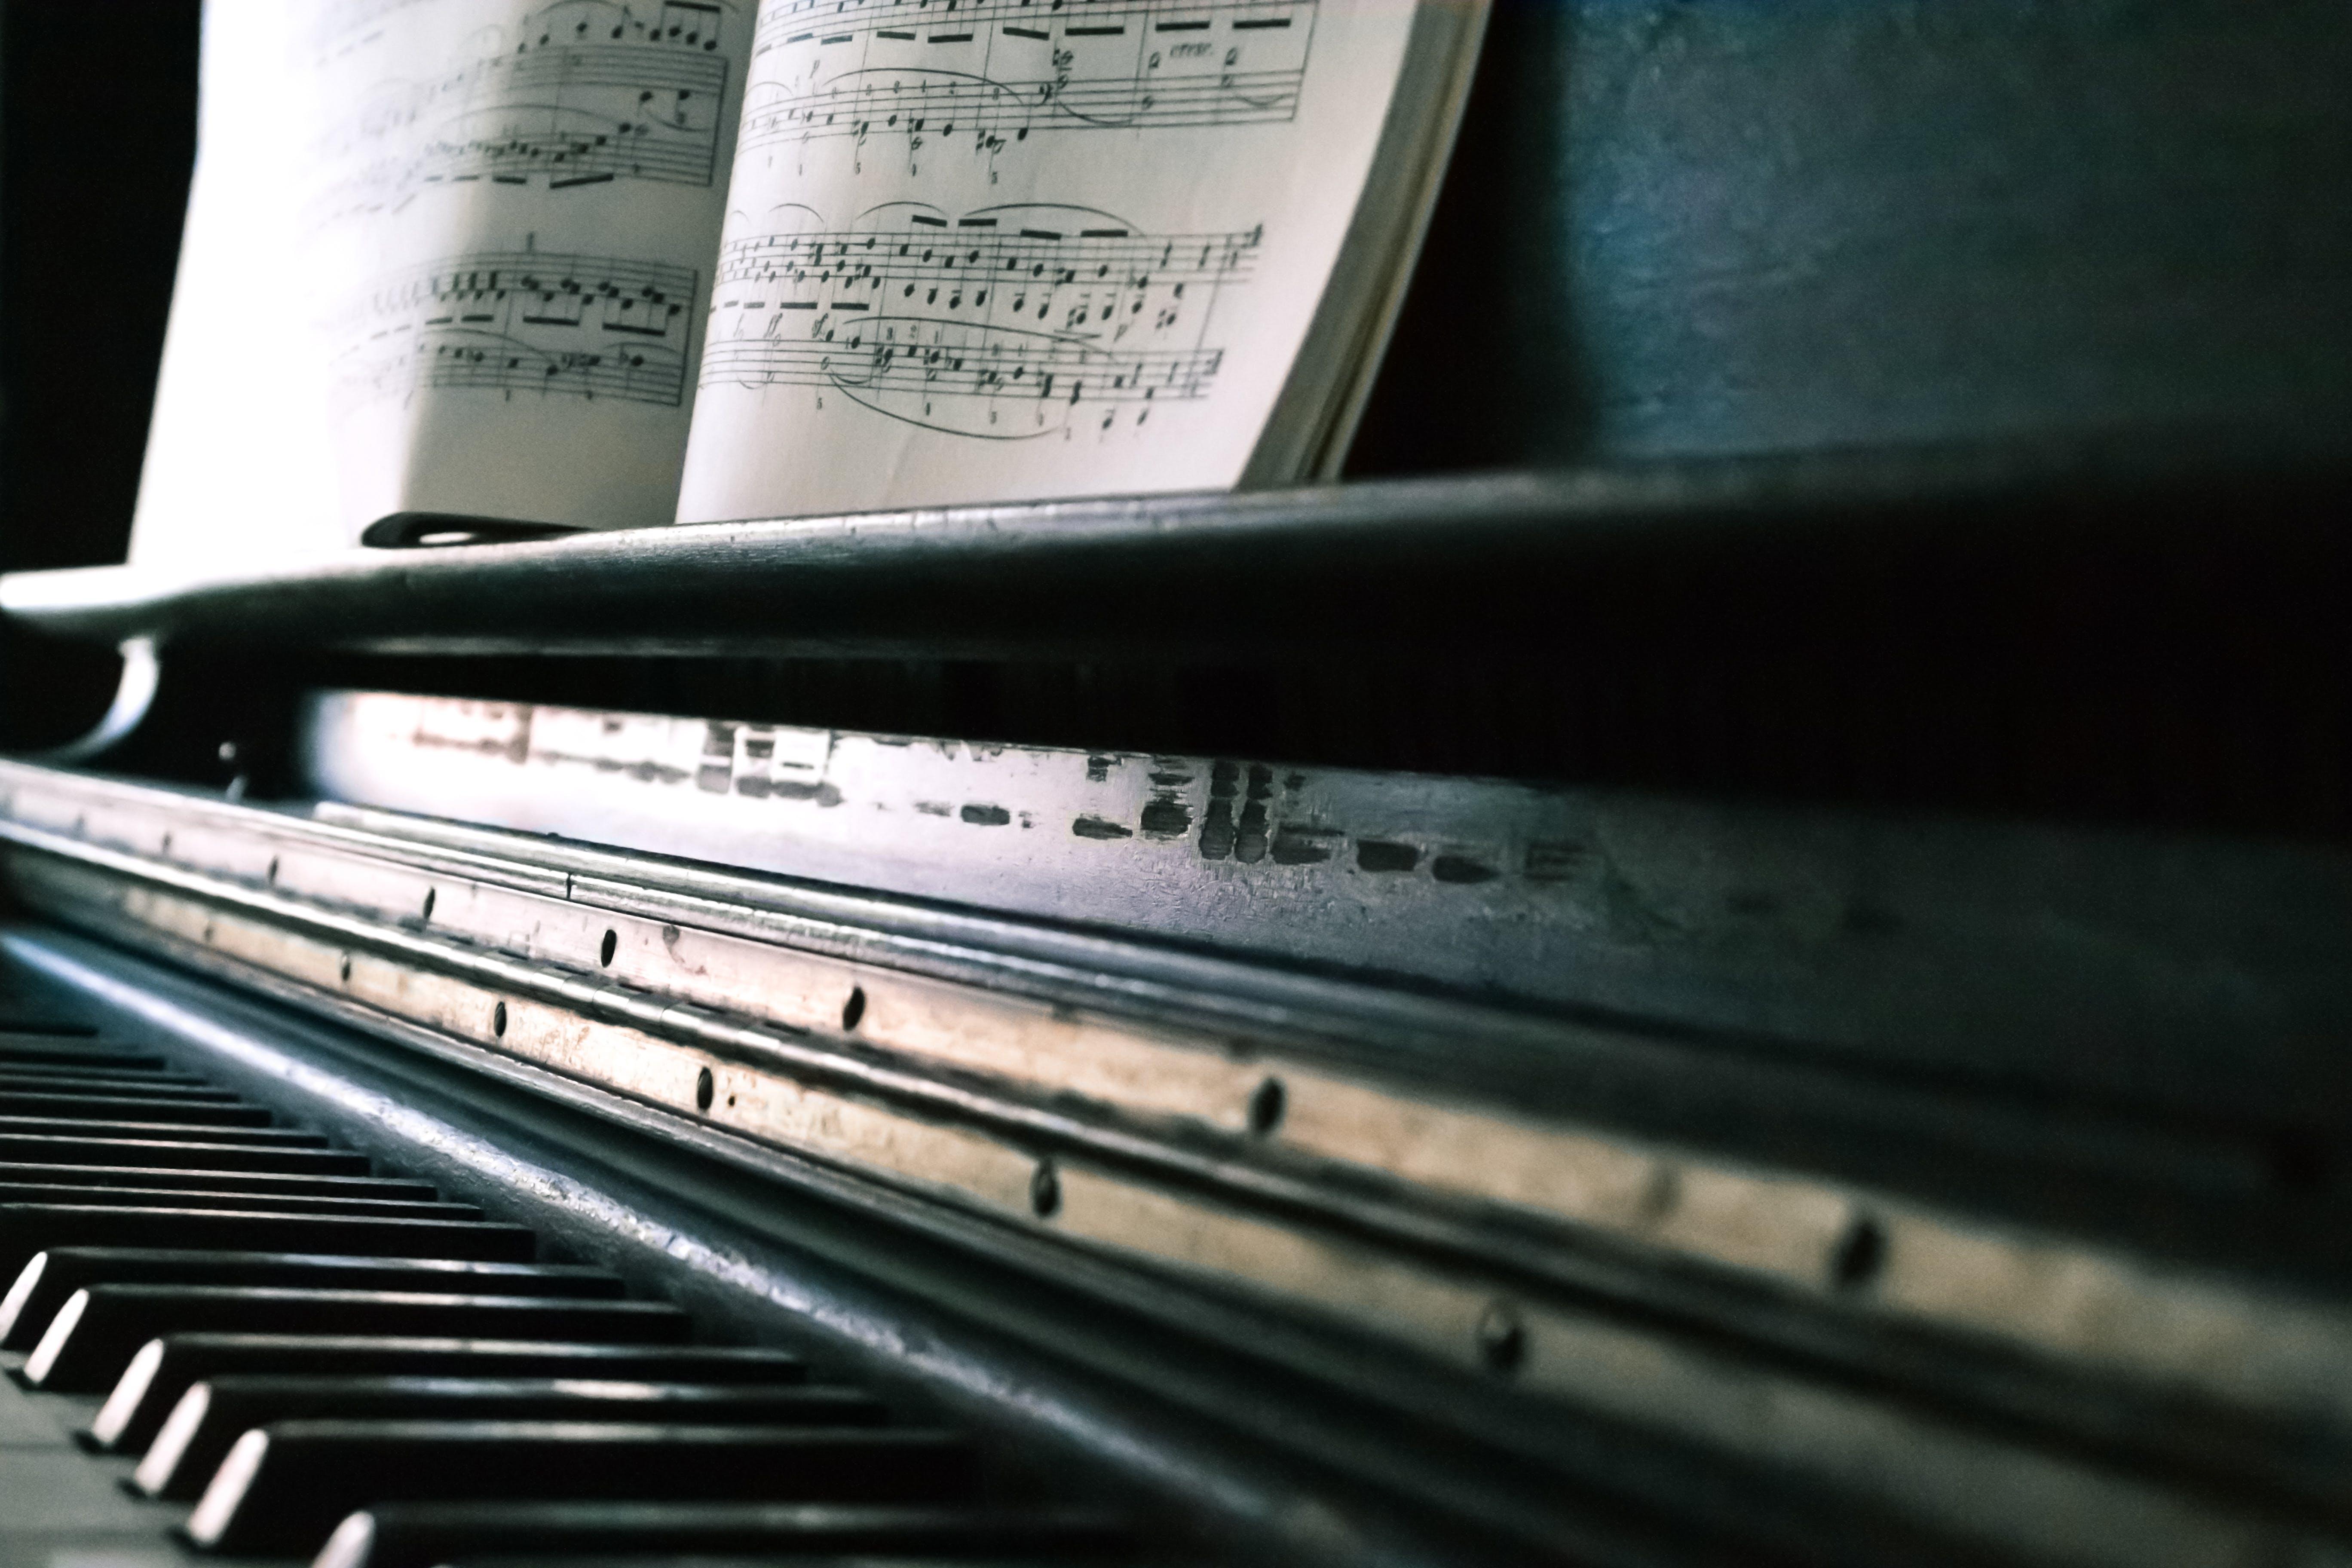 Music Sheet on Black Piano